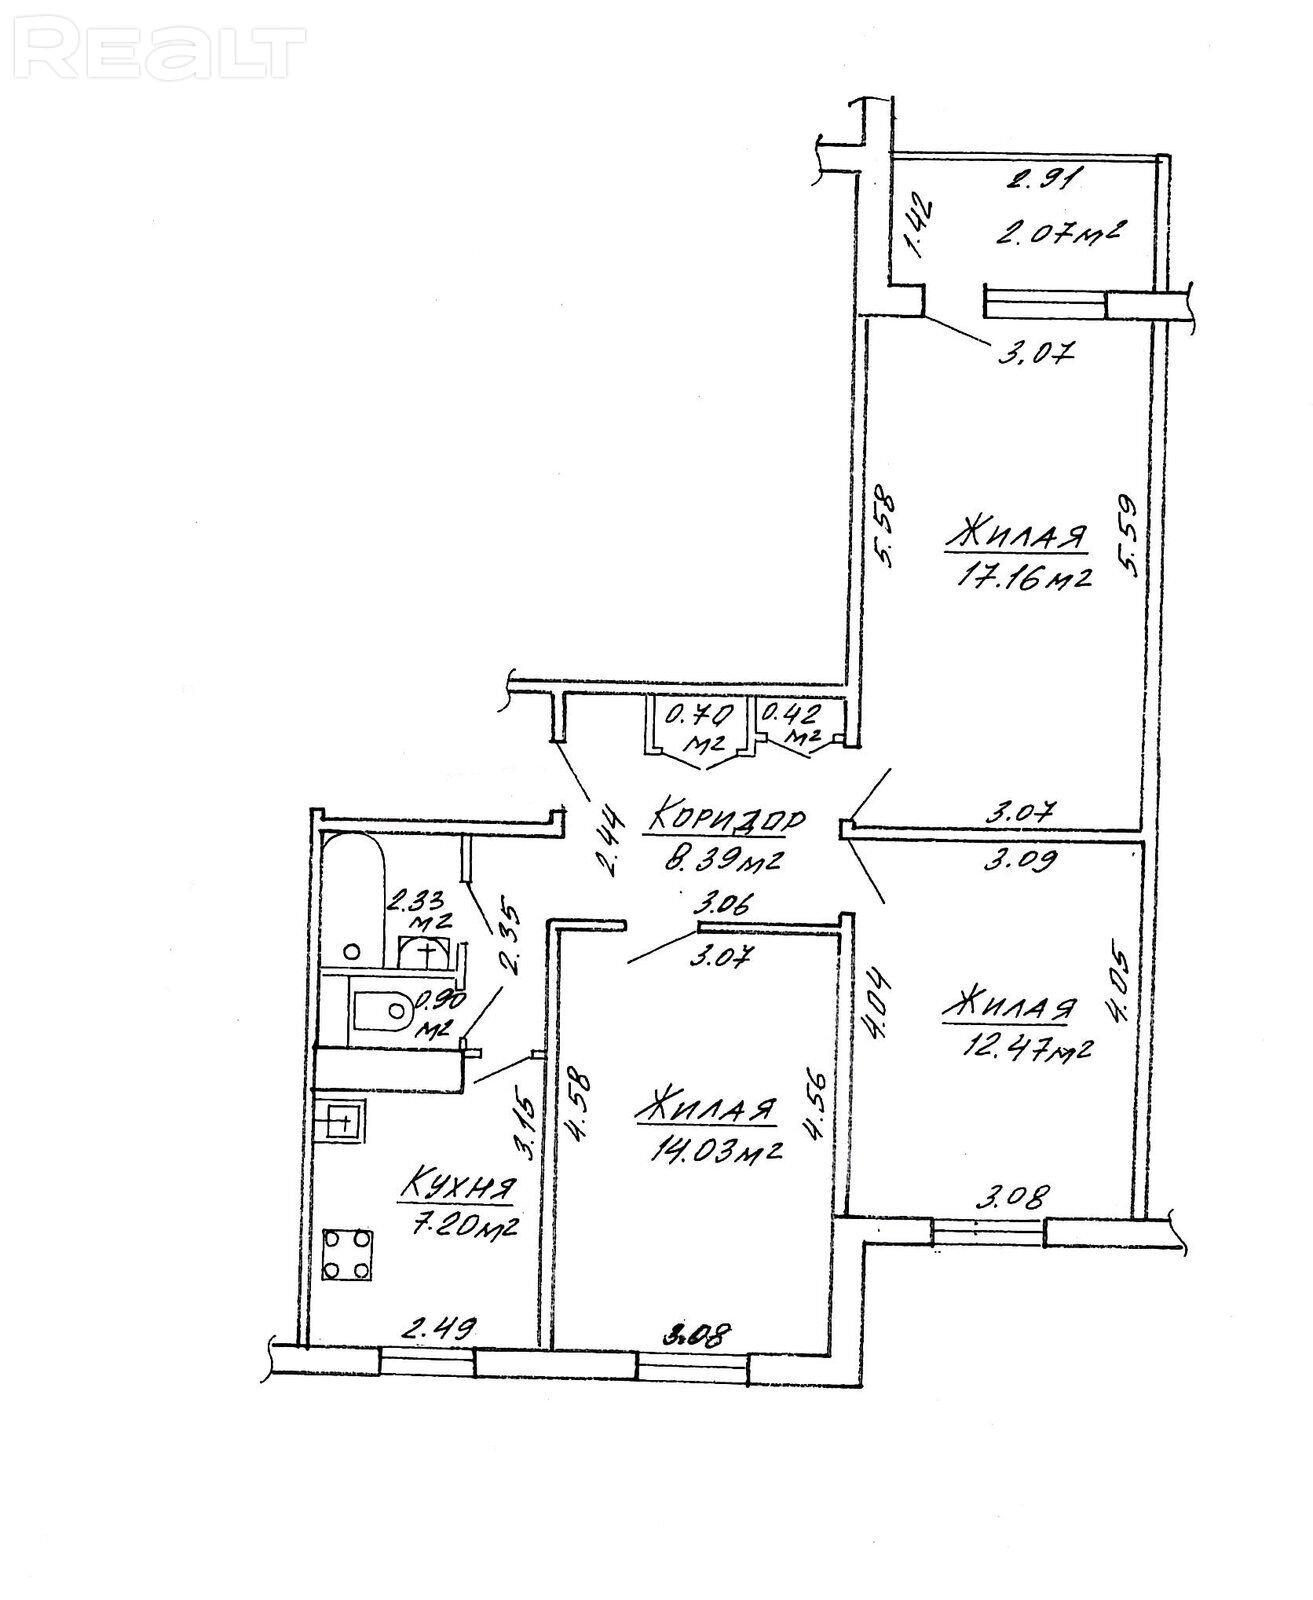 Продажа 3-х комнатной квартиры, ул. Лещинского, дом 17 (р-н Кунцевщина).